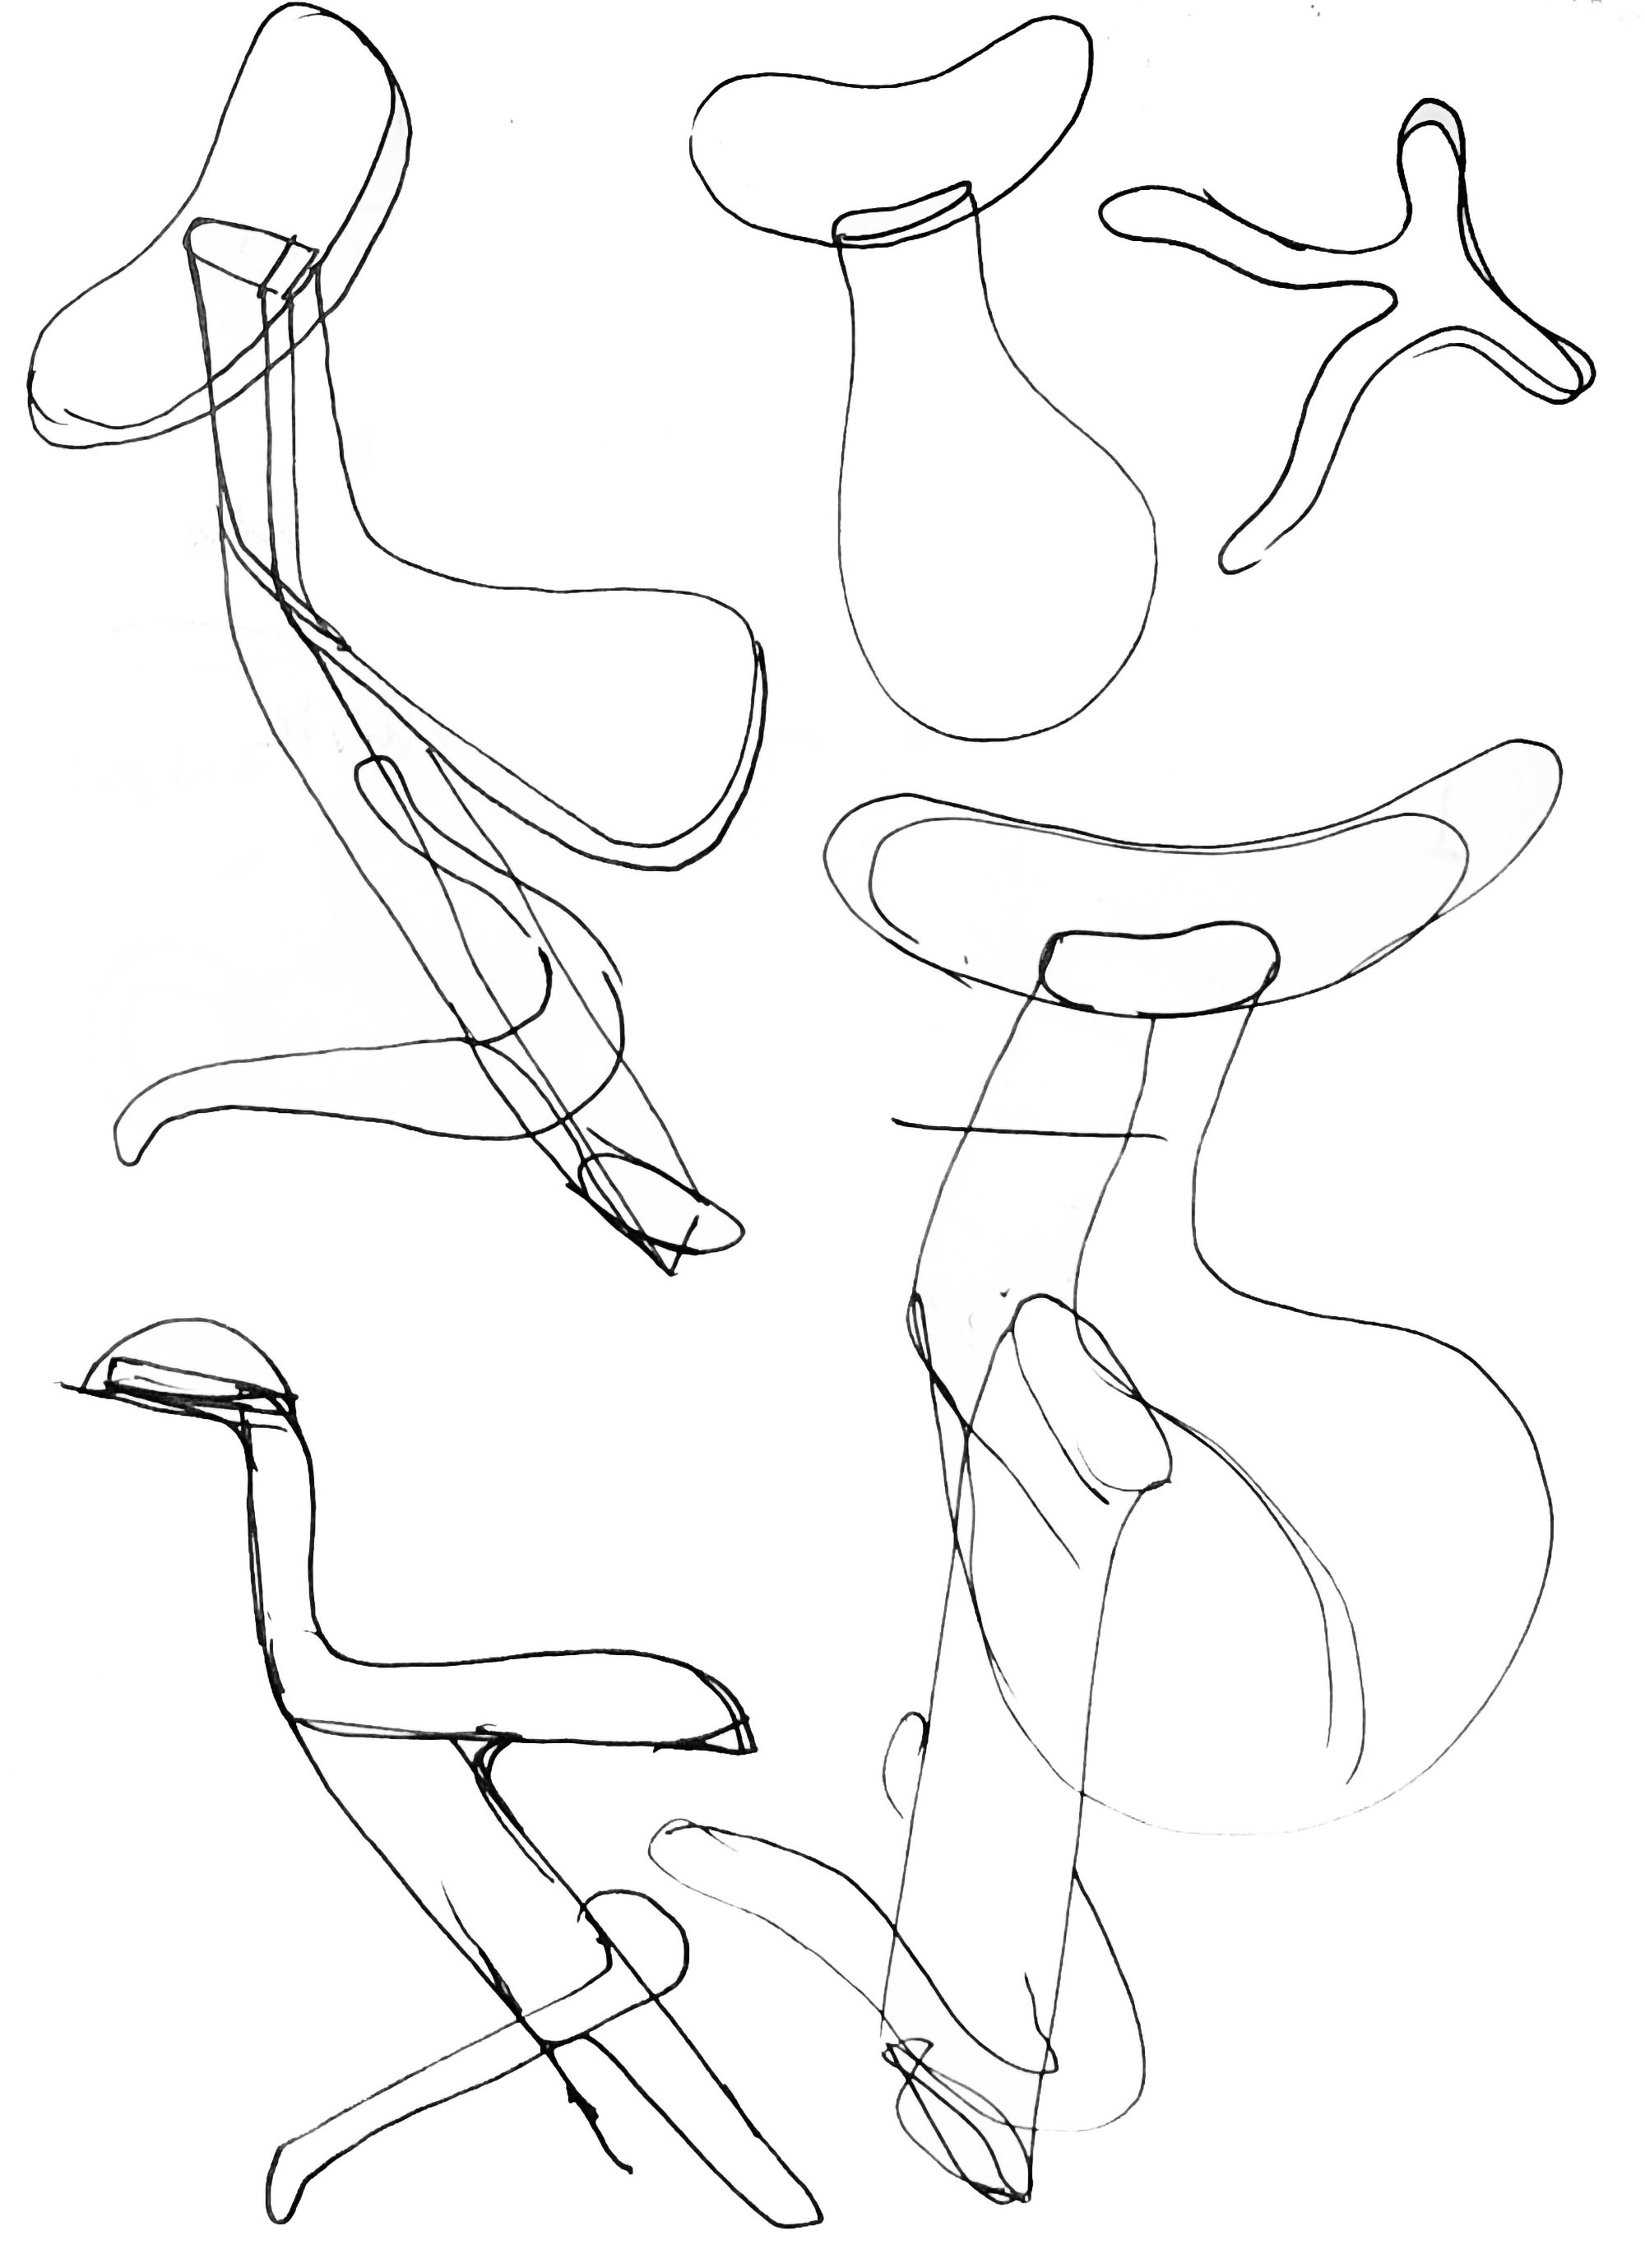 Pascal Hien_Migo_Prototypes 1